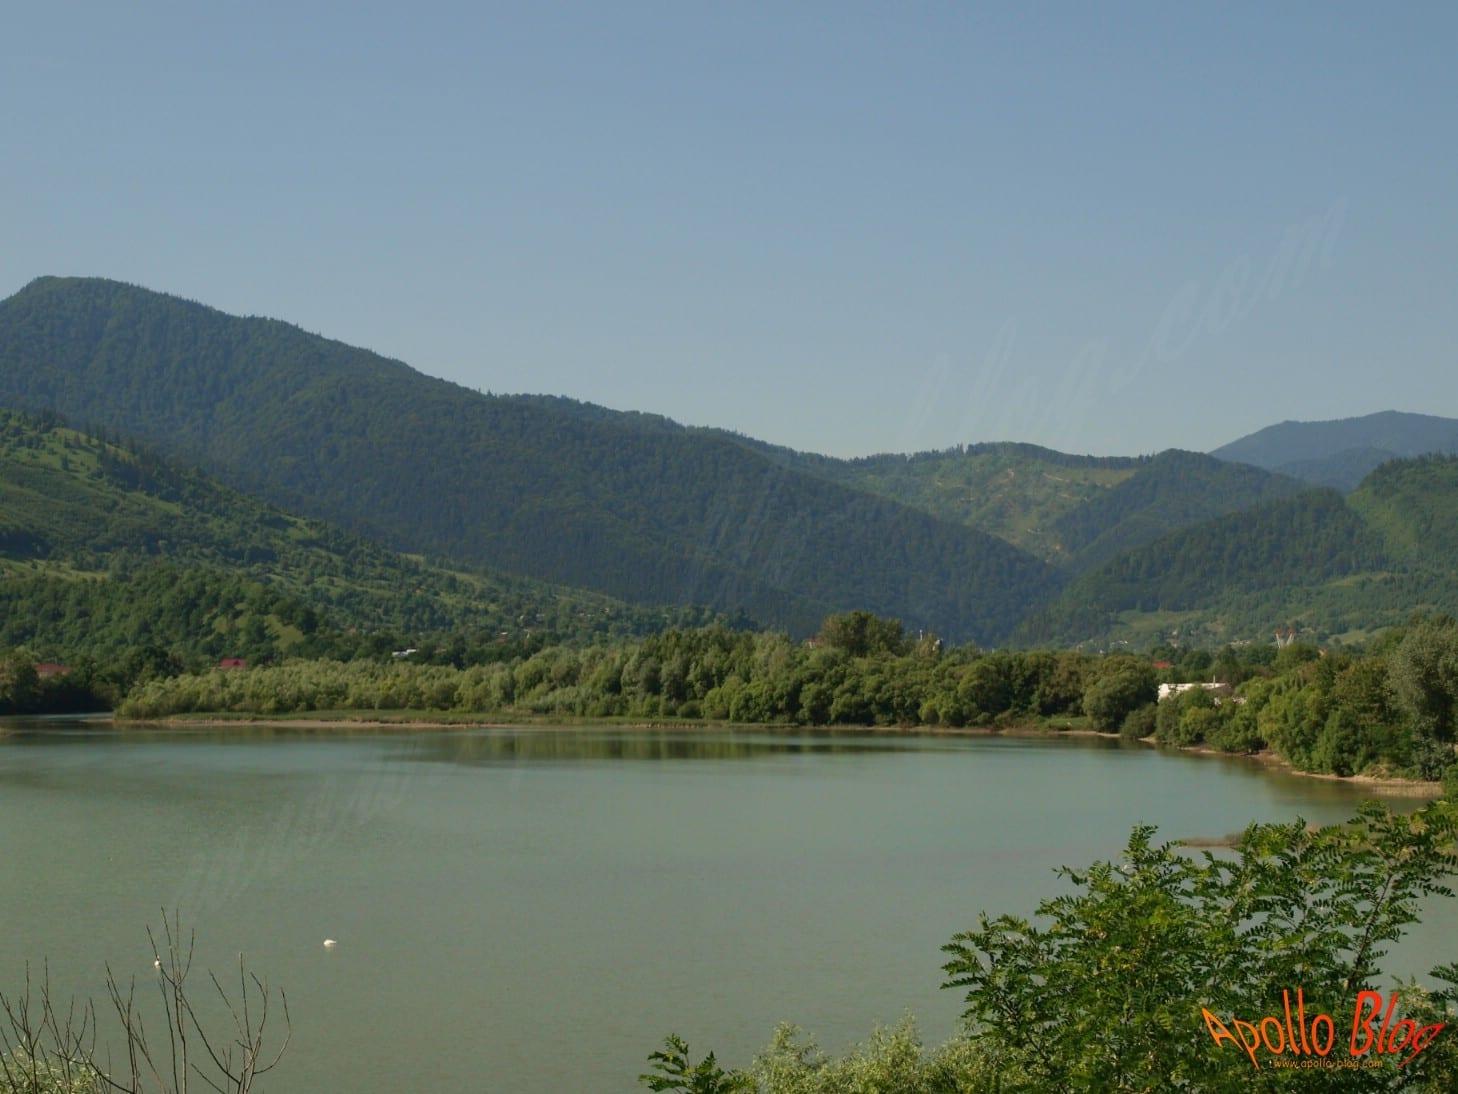 lacul pangari - clement apartments - cazare neamt